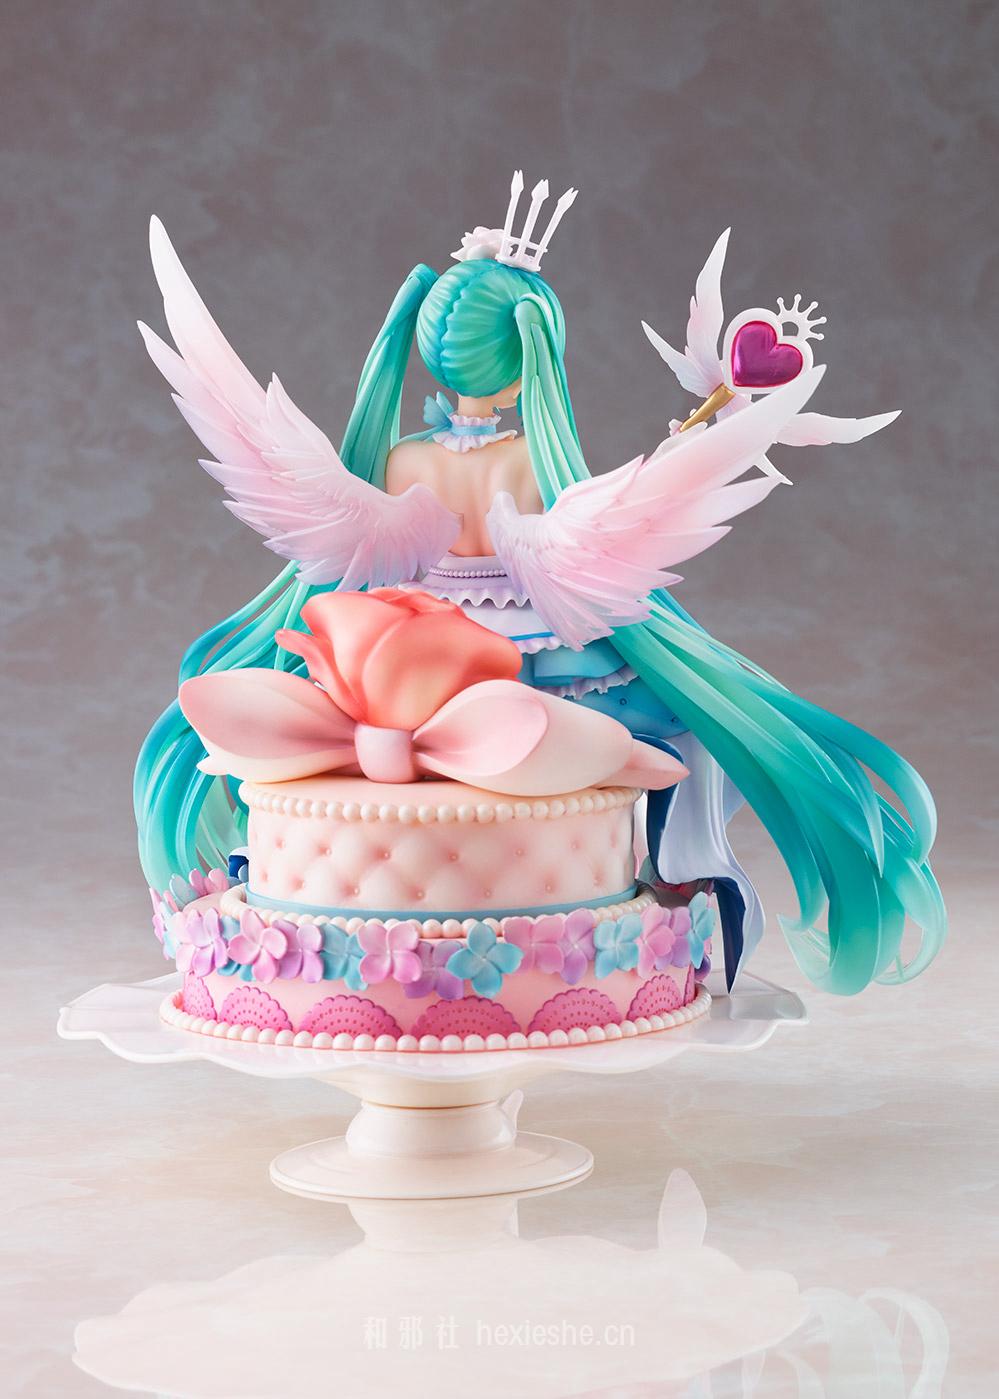 初音未来 Birthday 2020~Sweet Angel ver_和邪社09